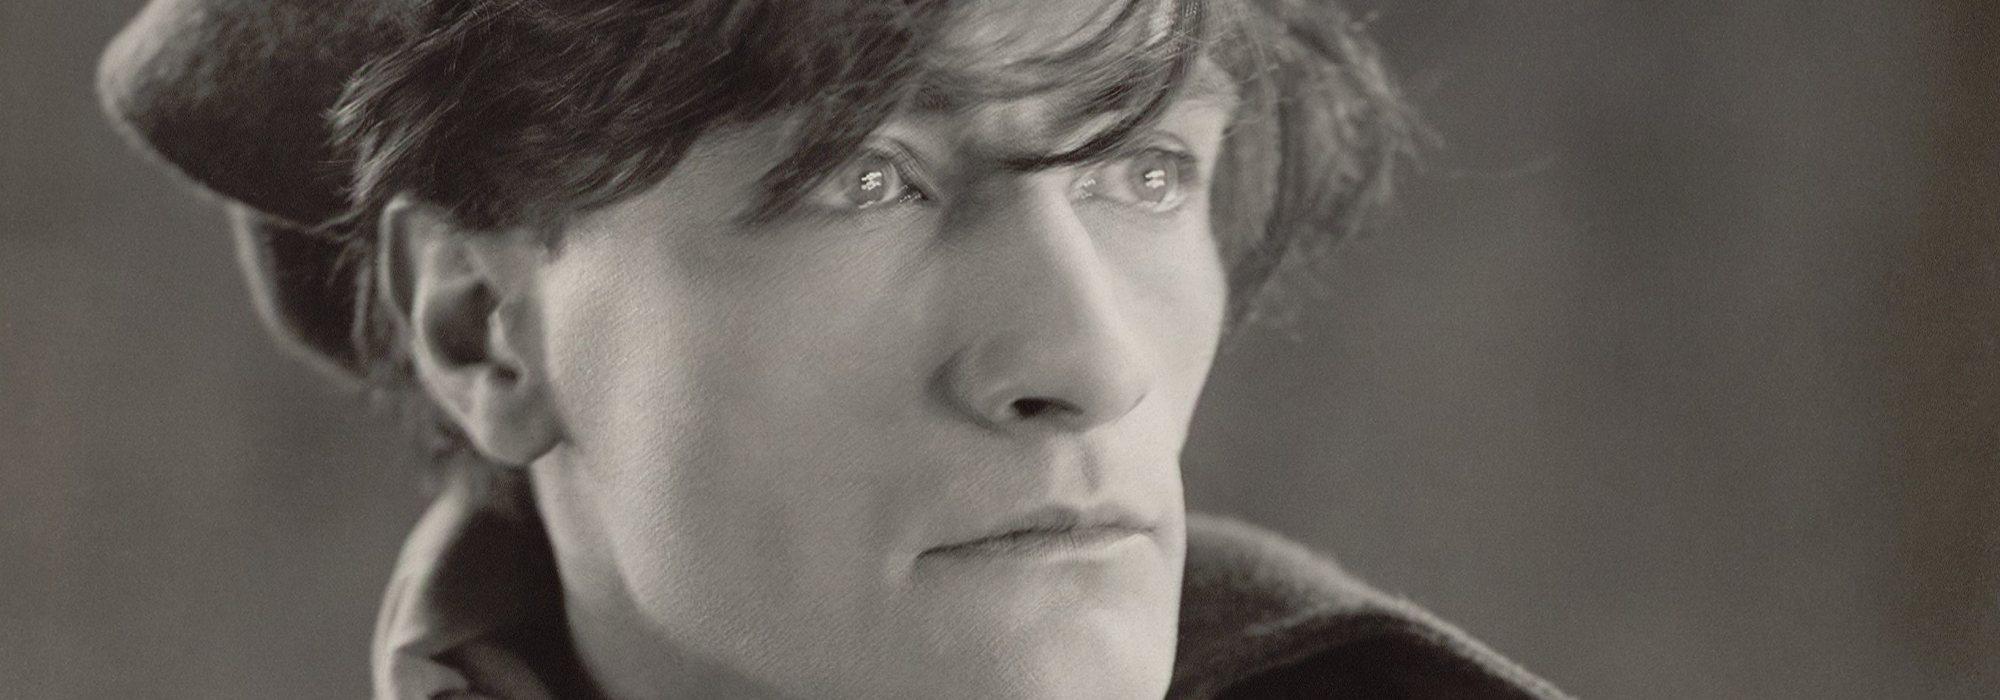 Black and white photographic portrait of Antonin Artaud